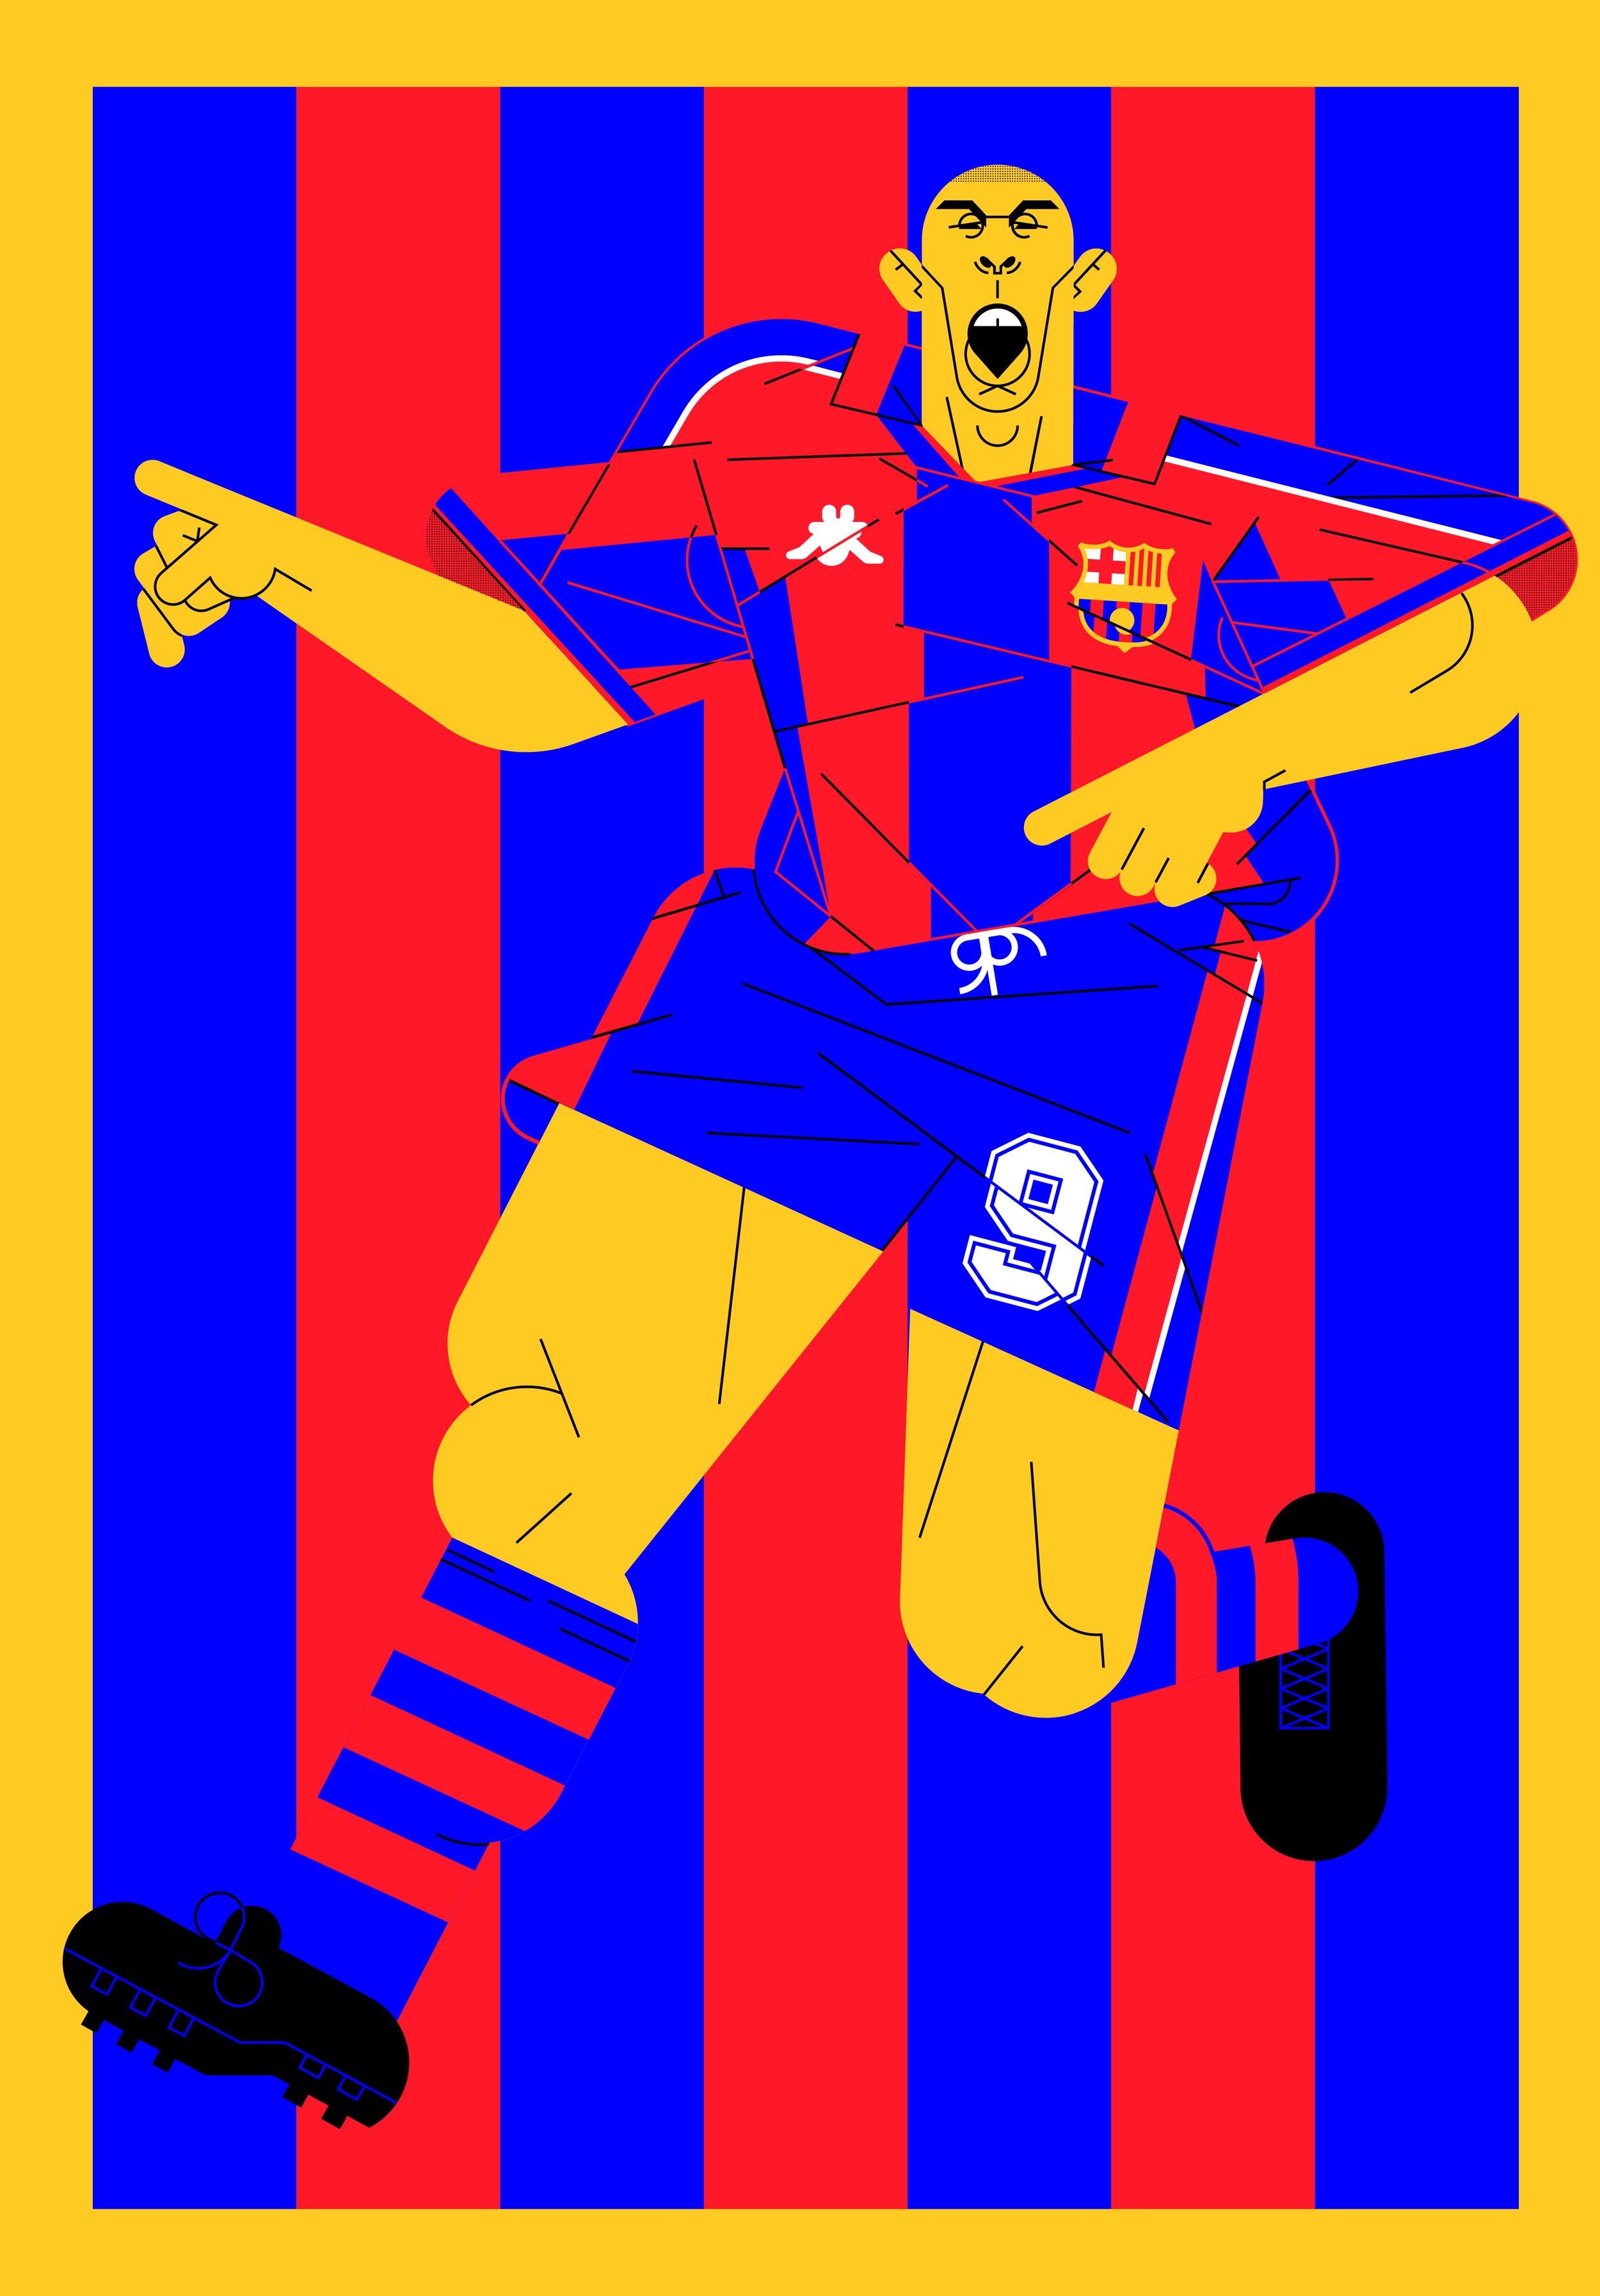 Football Players_Ronaldo 9 Barcelona_web.png